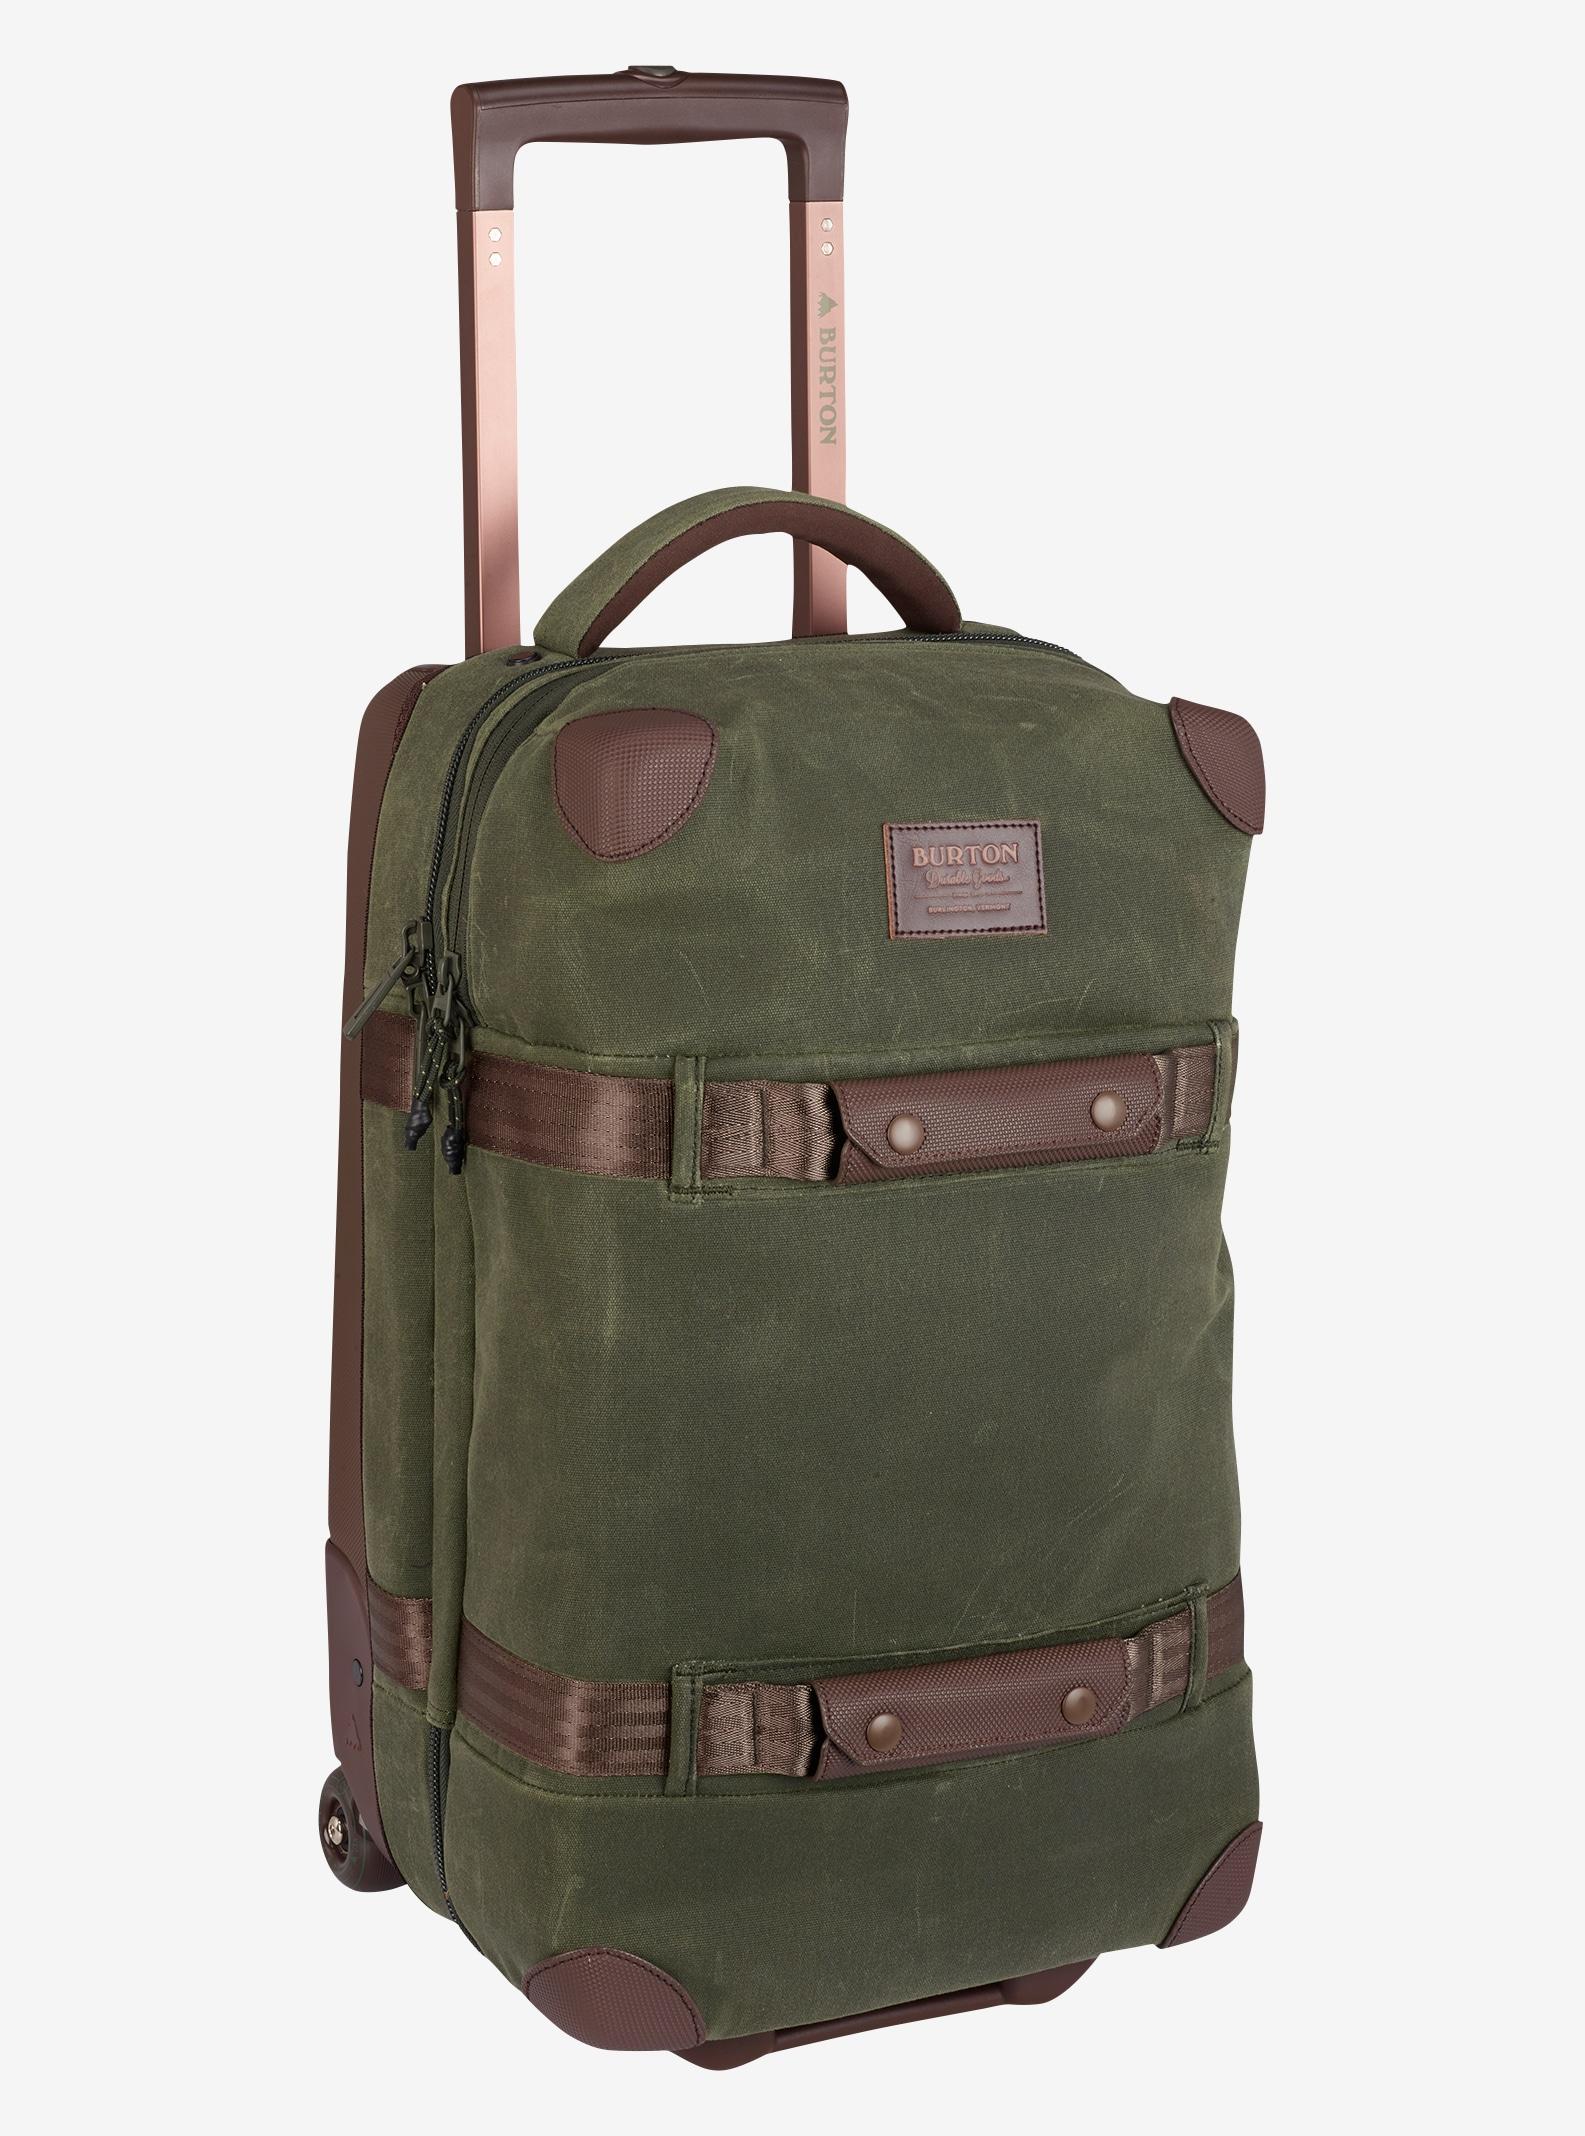 Carry-On Luggage | Burton Snowboards